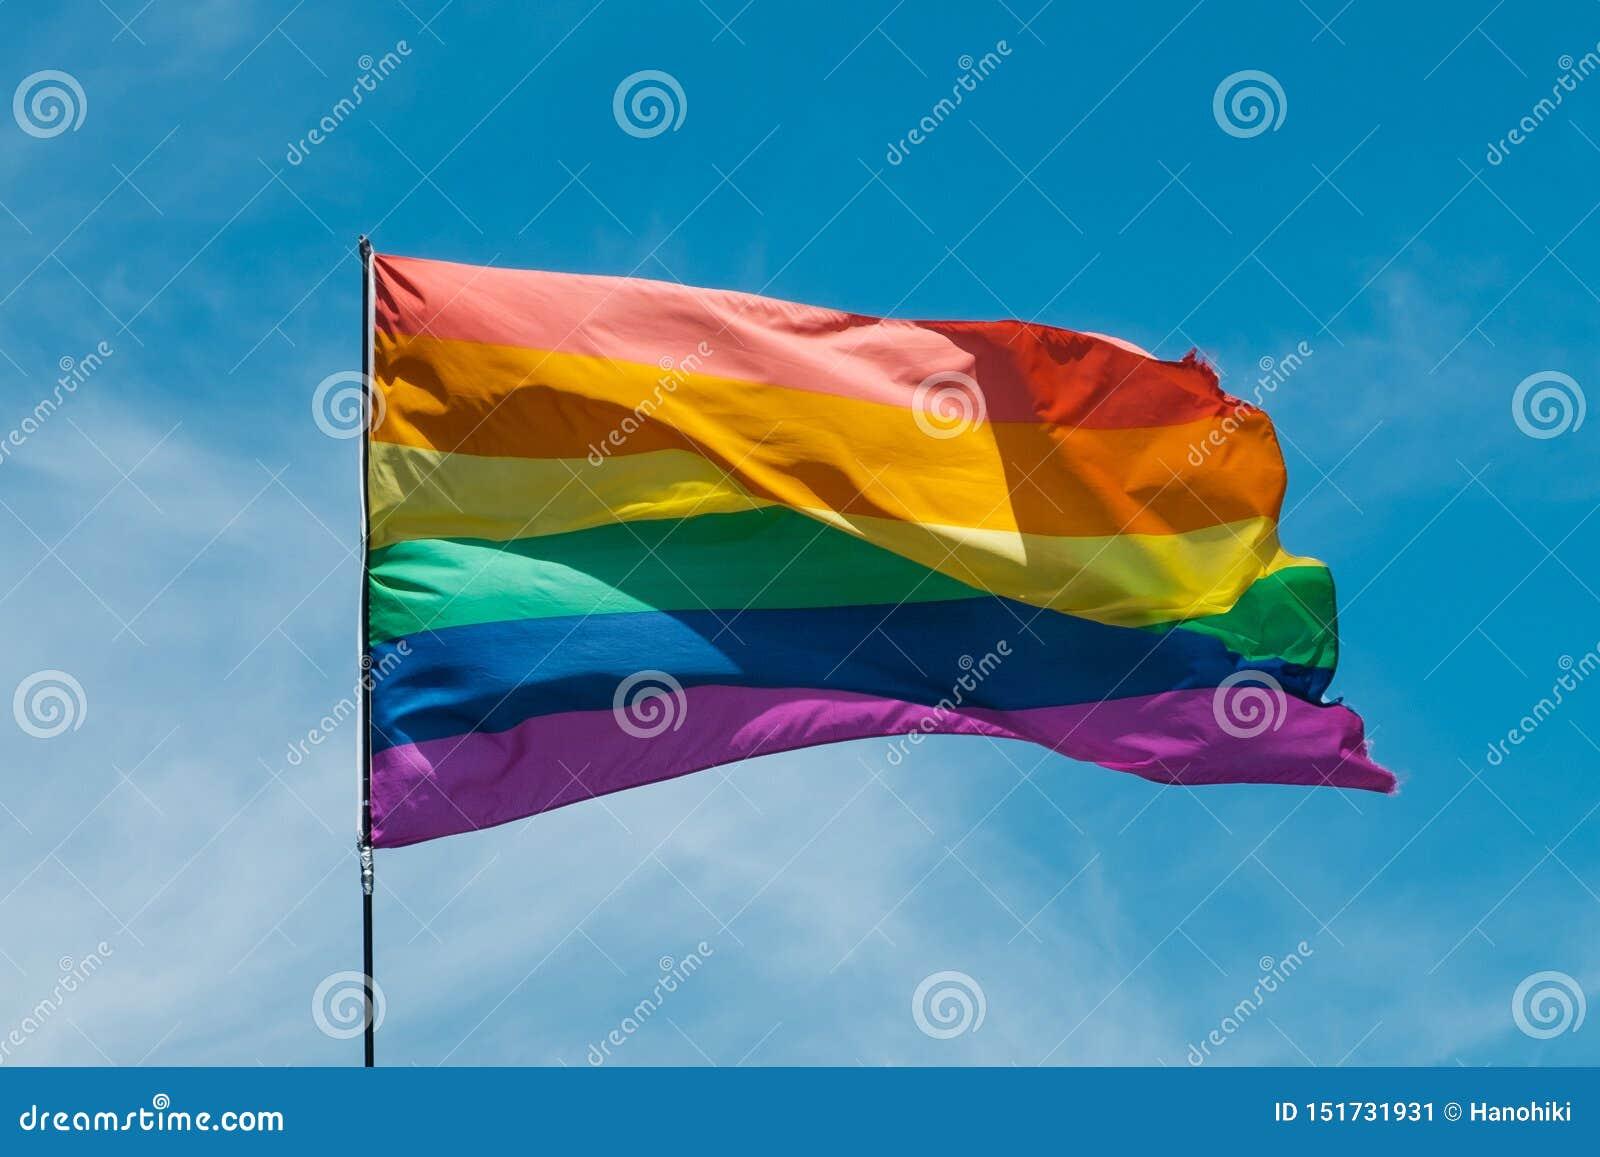 Gay rainbow flag waving with blue sky background - symbol of Gay Pride